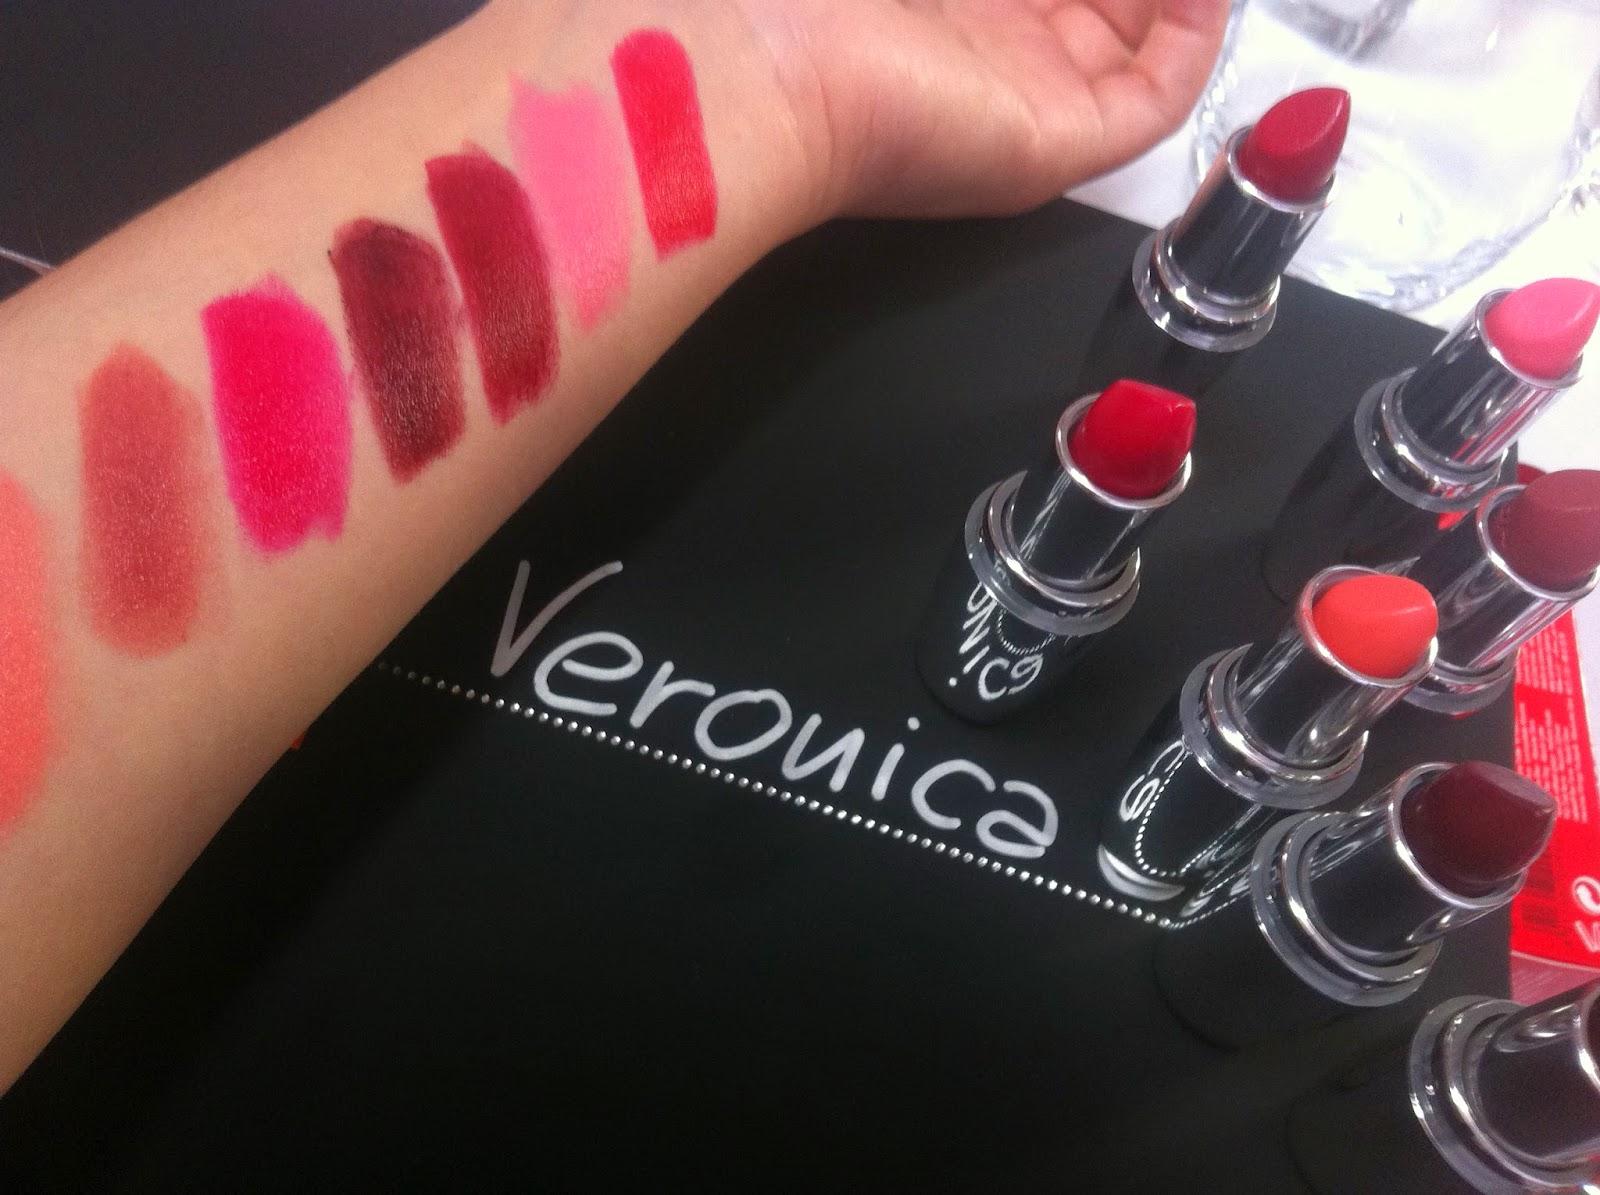 PUPA rossetti I'M Lipstick swatches 308 309 405